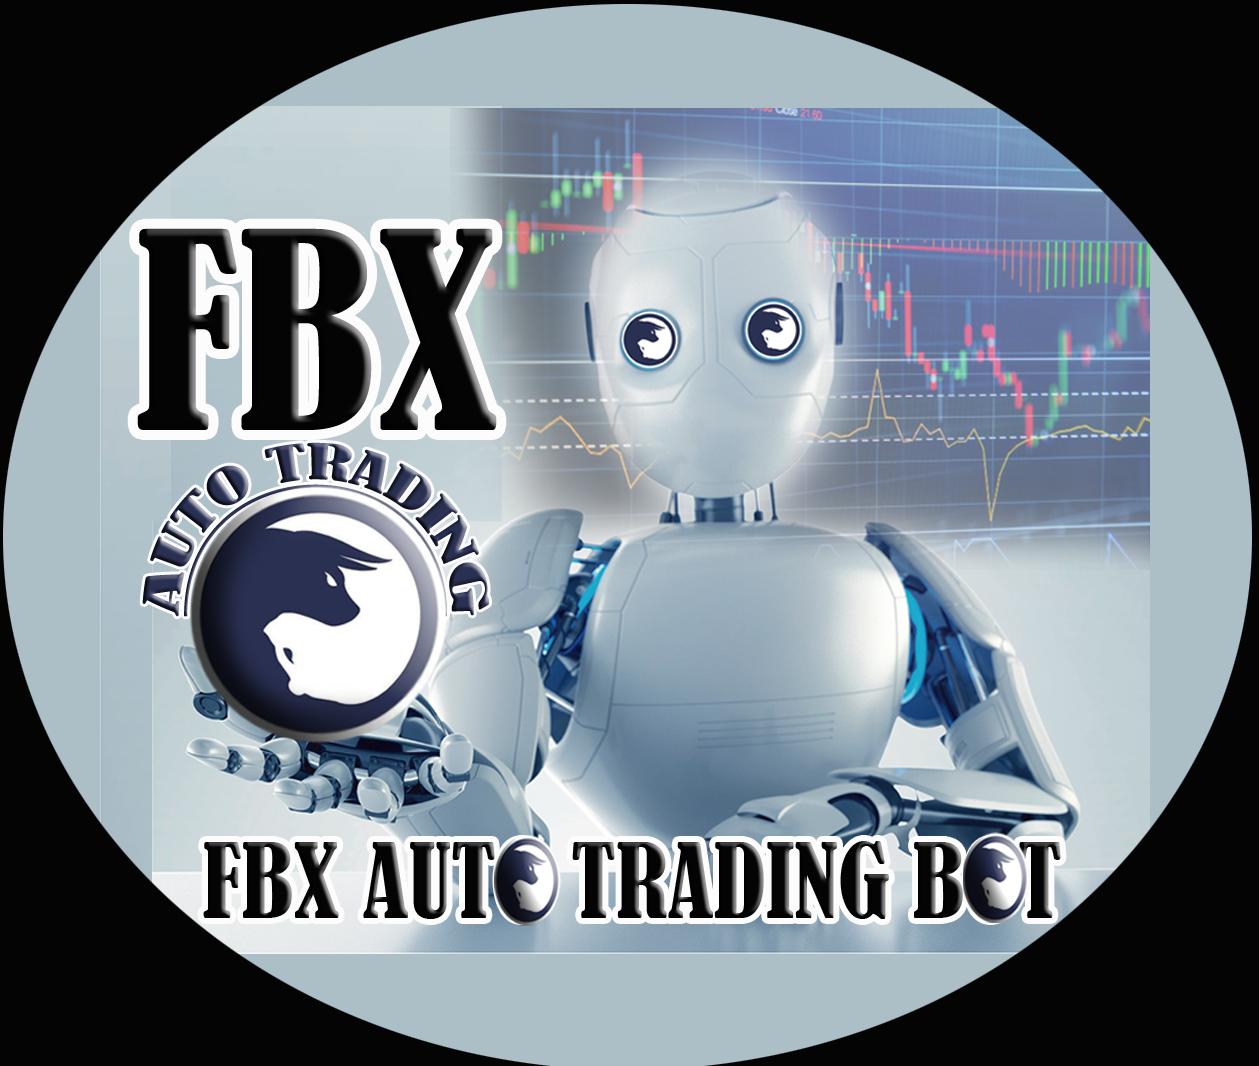 FBX AUTO TRADING BOT - Binary.com auto trading